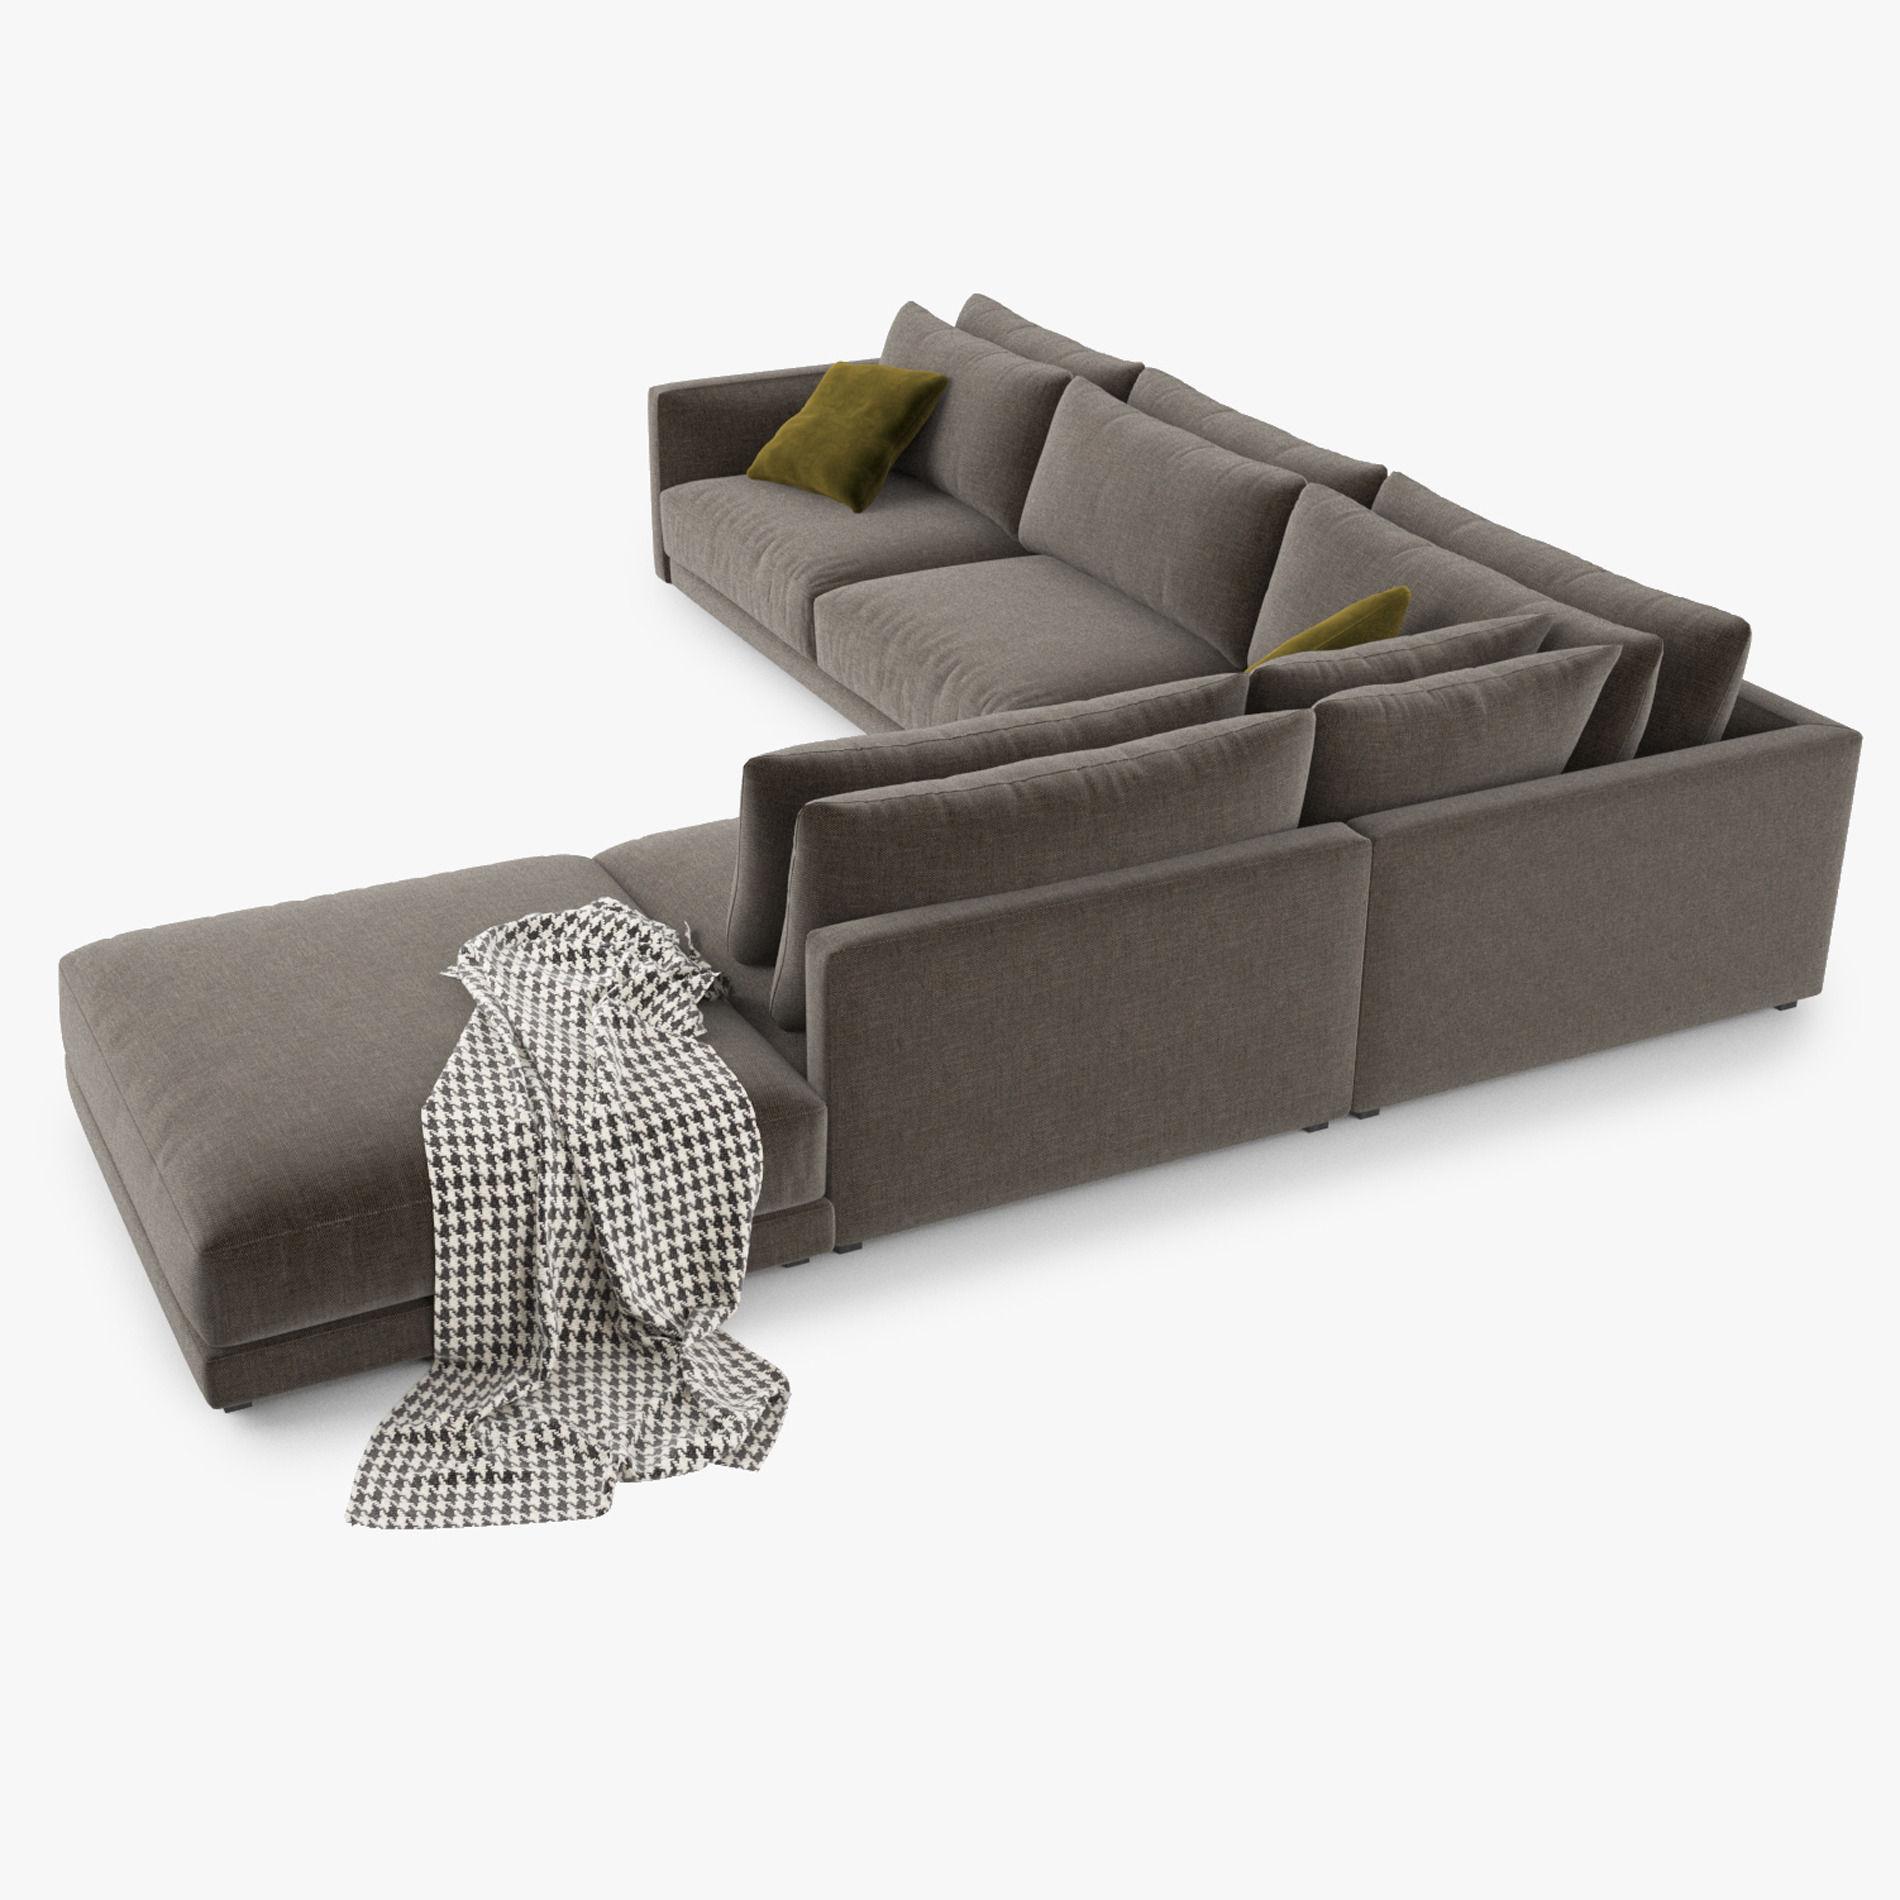 Poliform Furniture Price List Furniture Designs